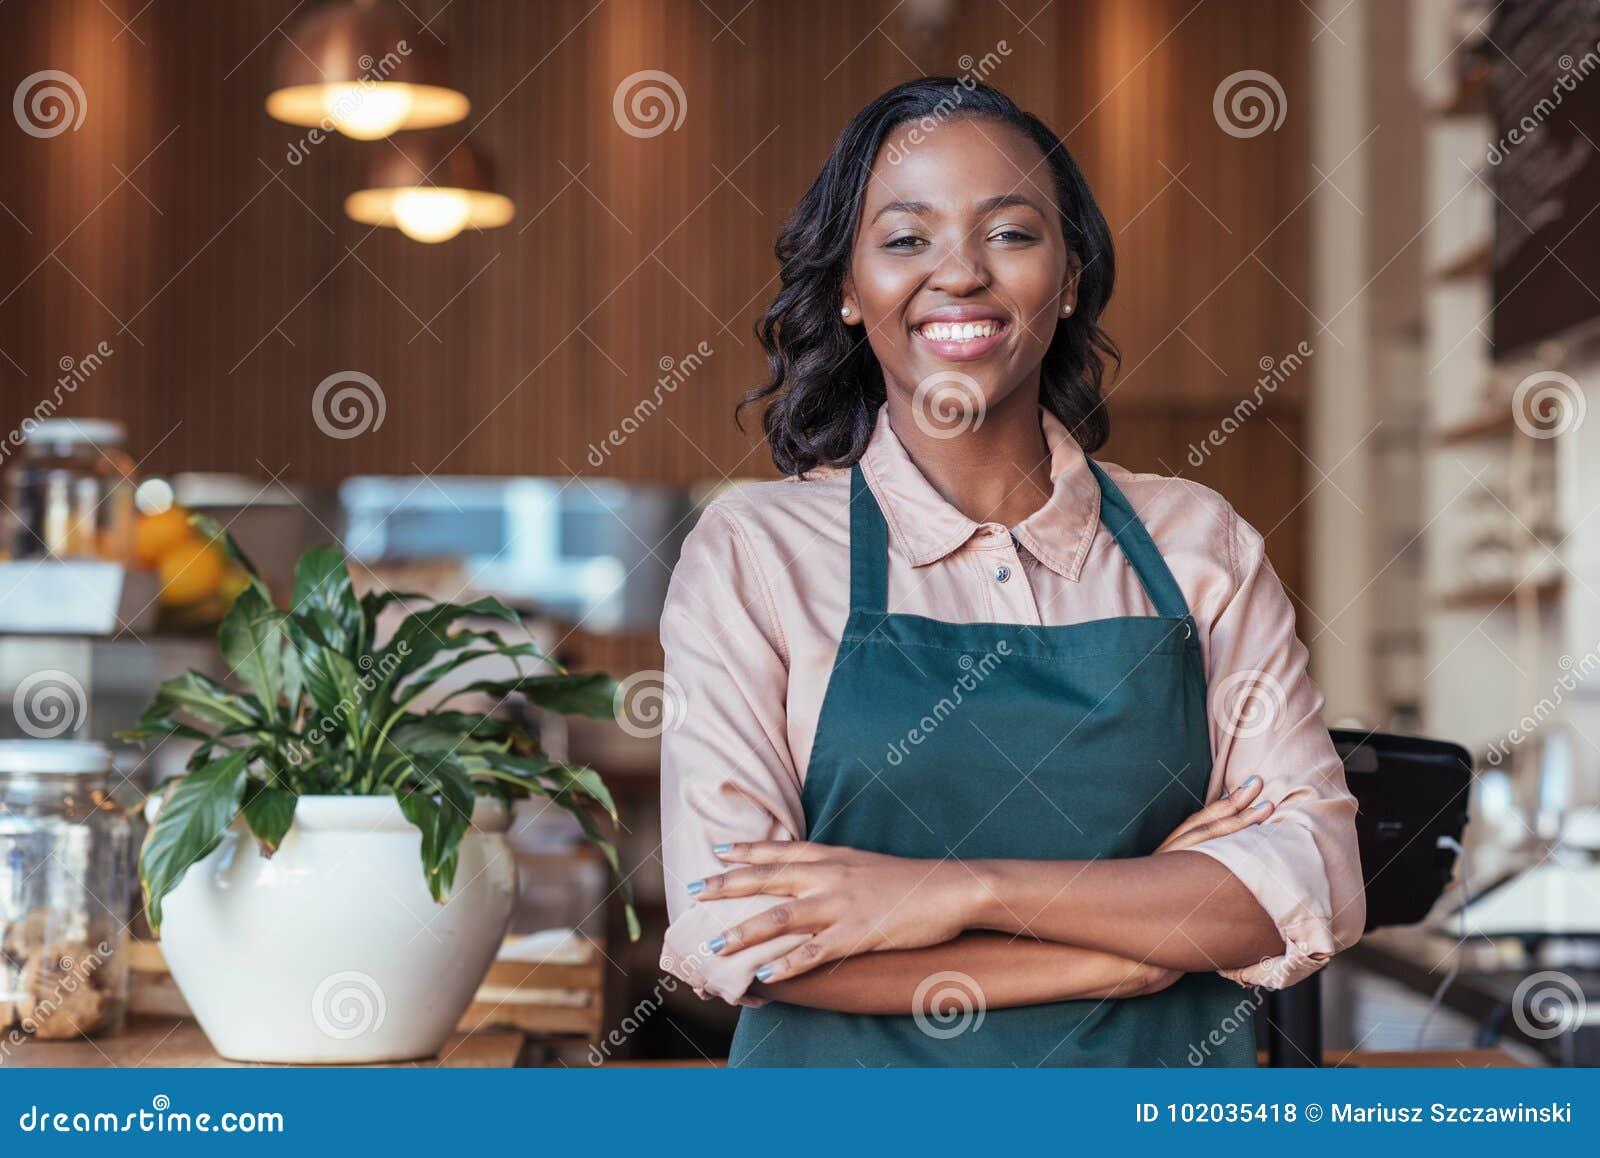 Glimlachende Afrikaanse ondernemer die zich bij de teller van haar koffie bevinden